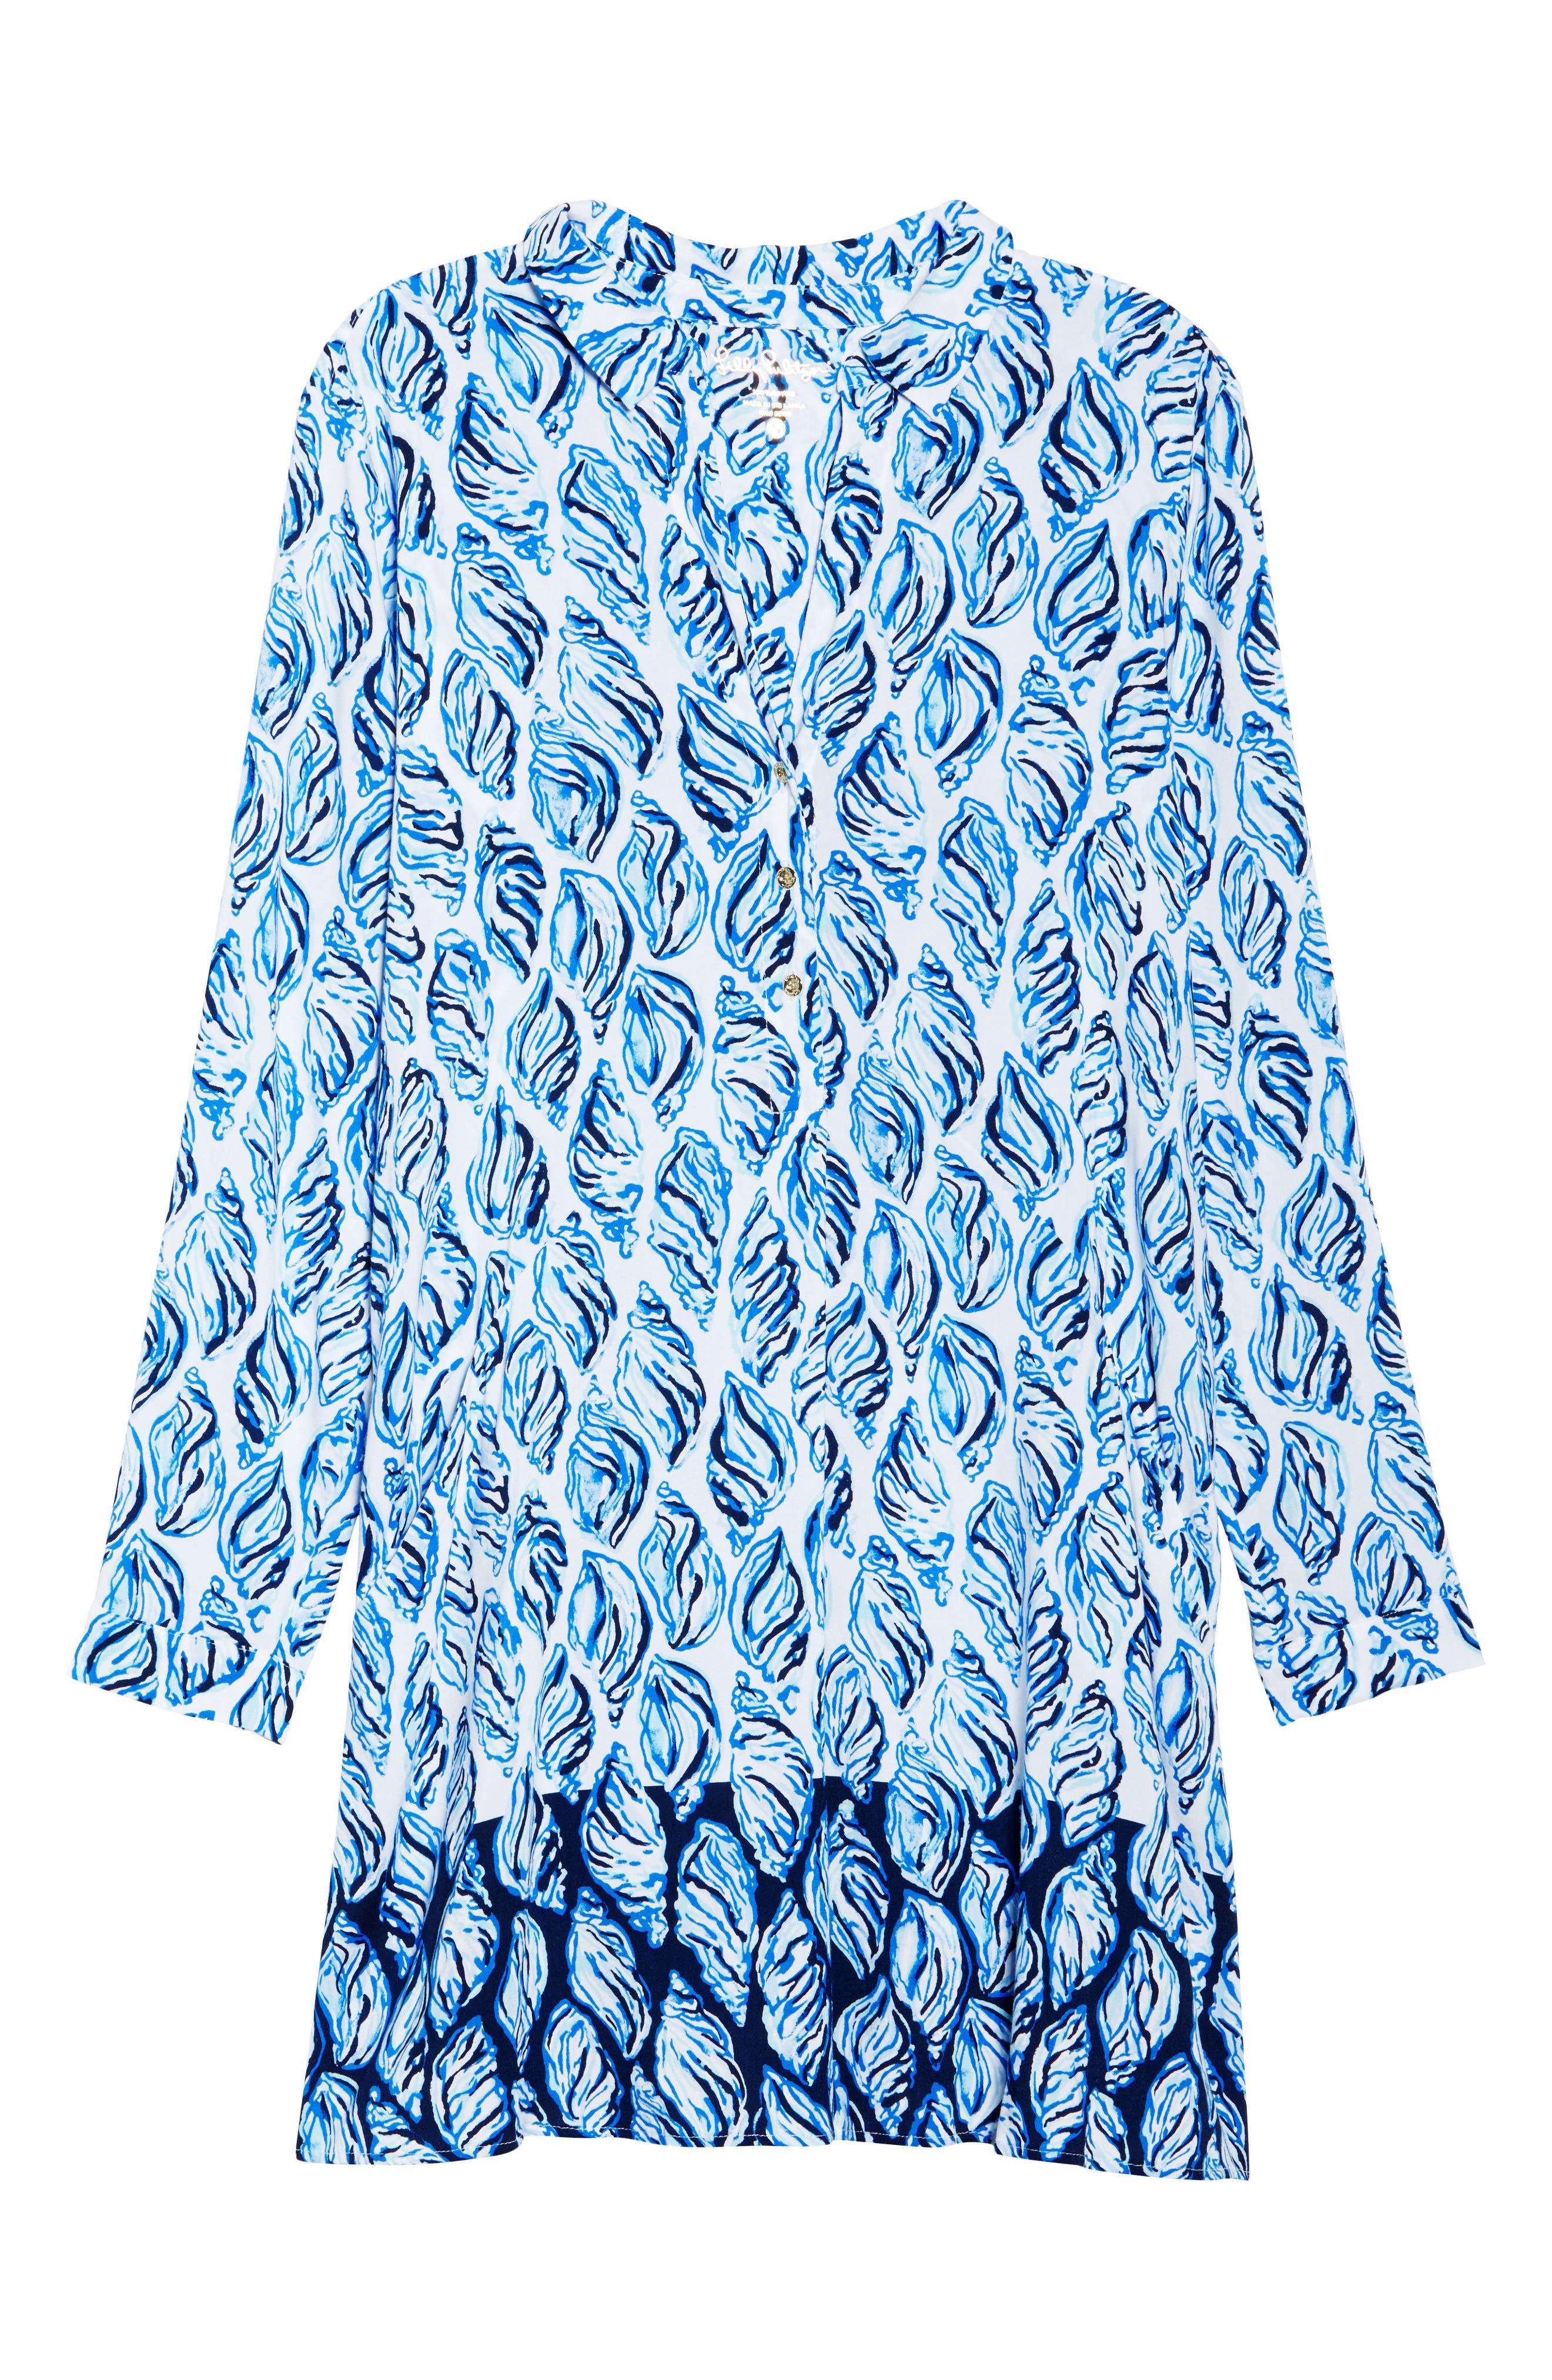 Lillith Shirtdress,                             Alternate thumbnail 8, color,                             100